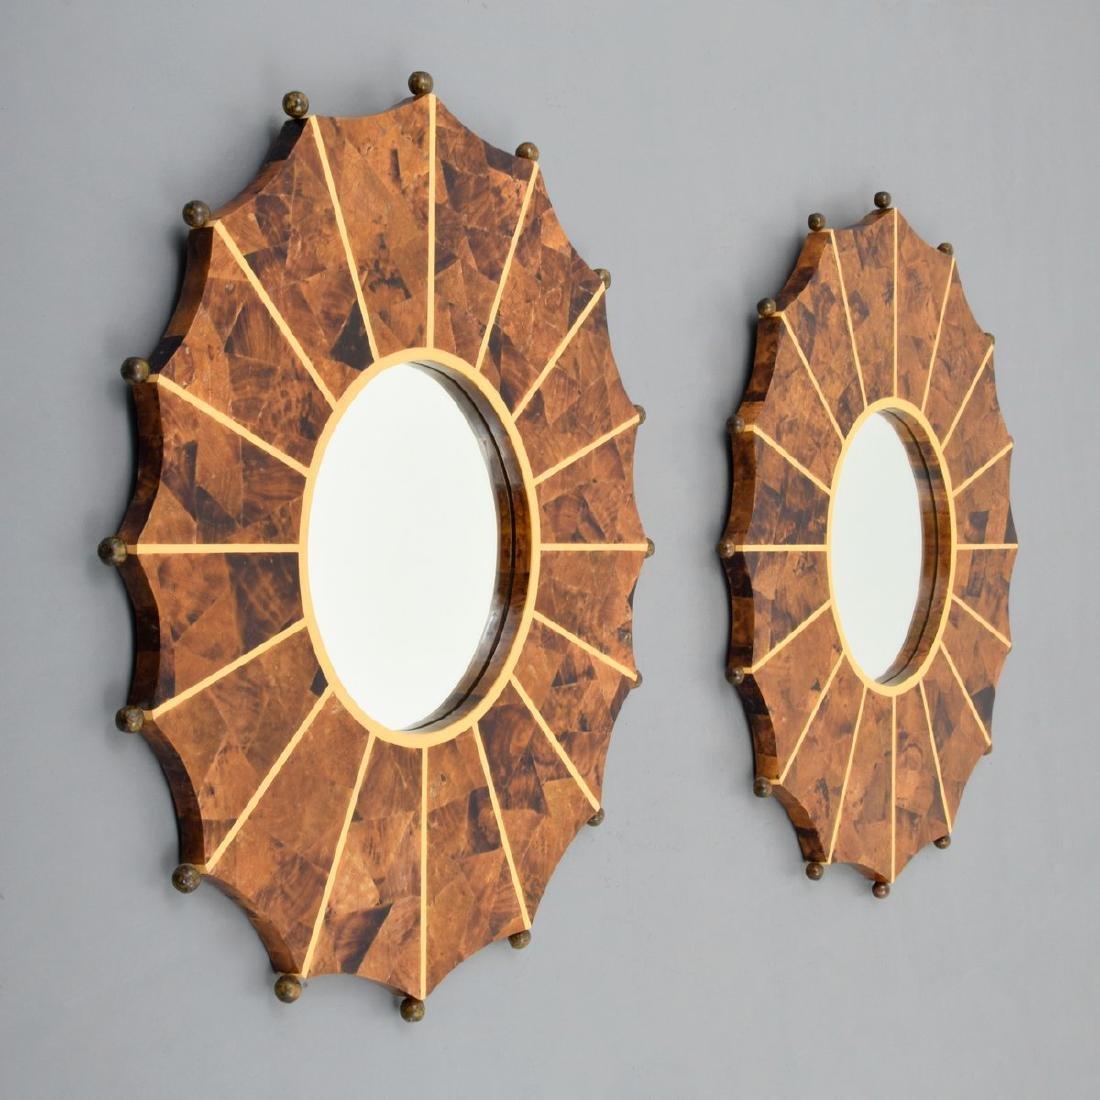 Pair of Mirrors, Manner of Karl Springer - 8